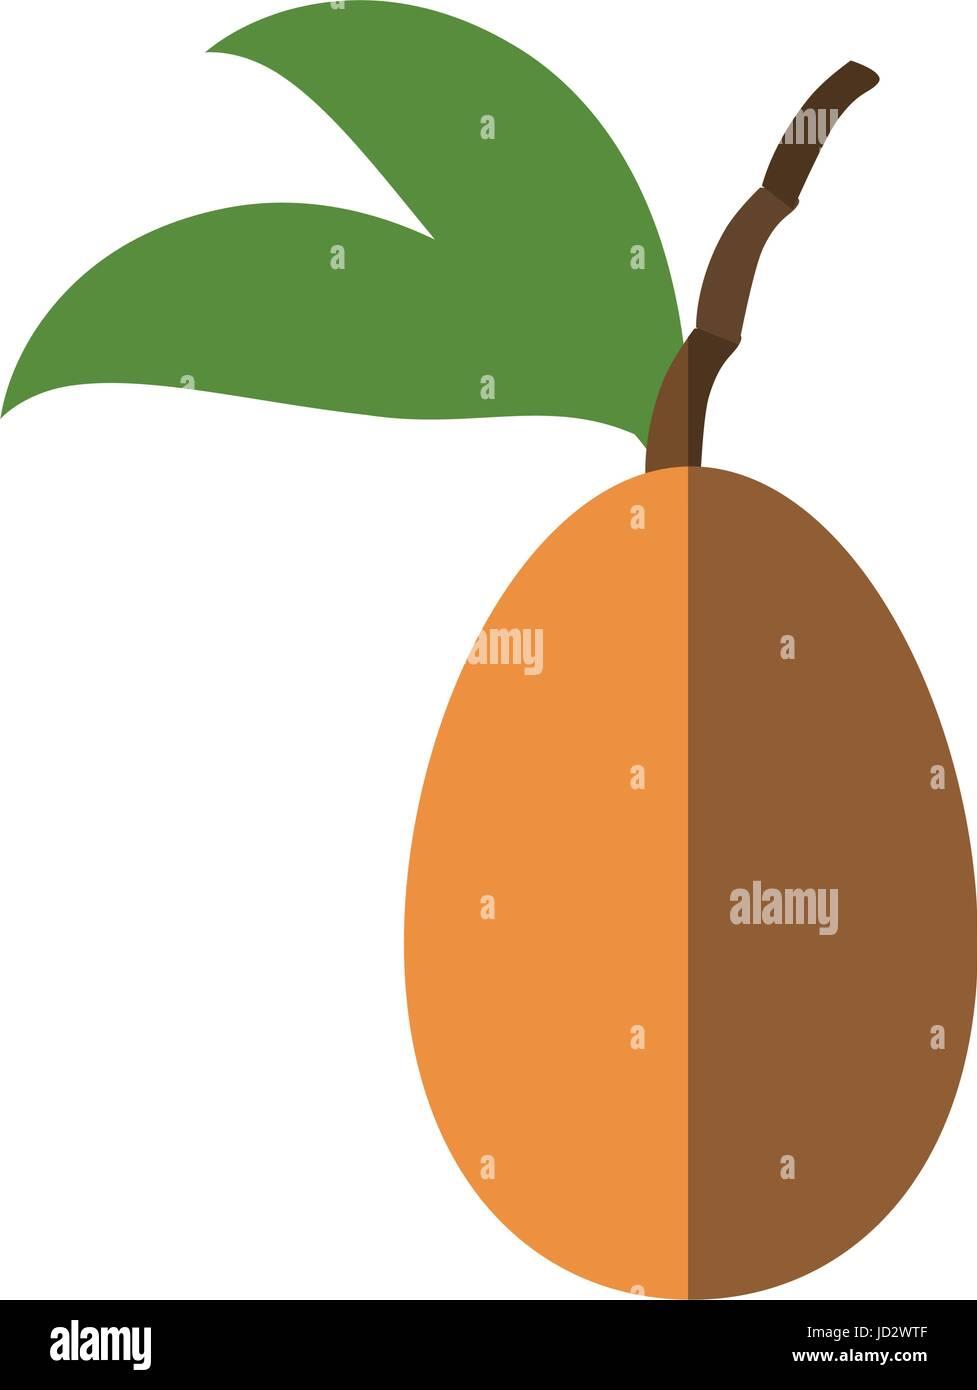 Tree tomato fruit - Stock Vector